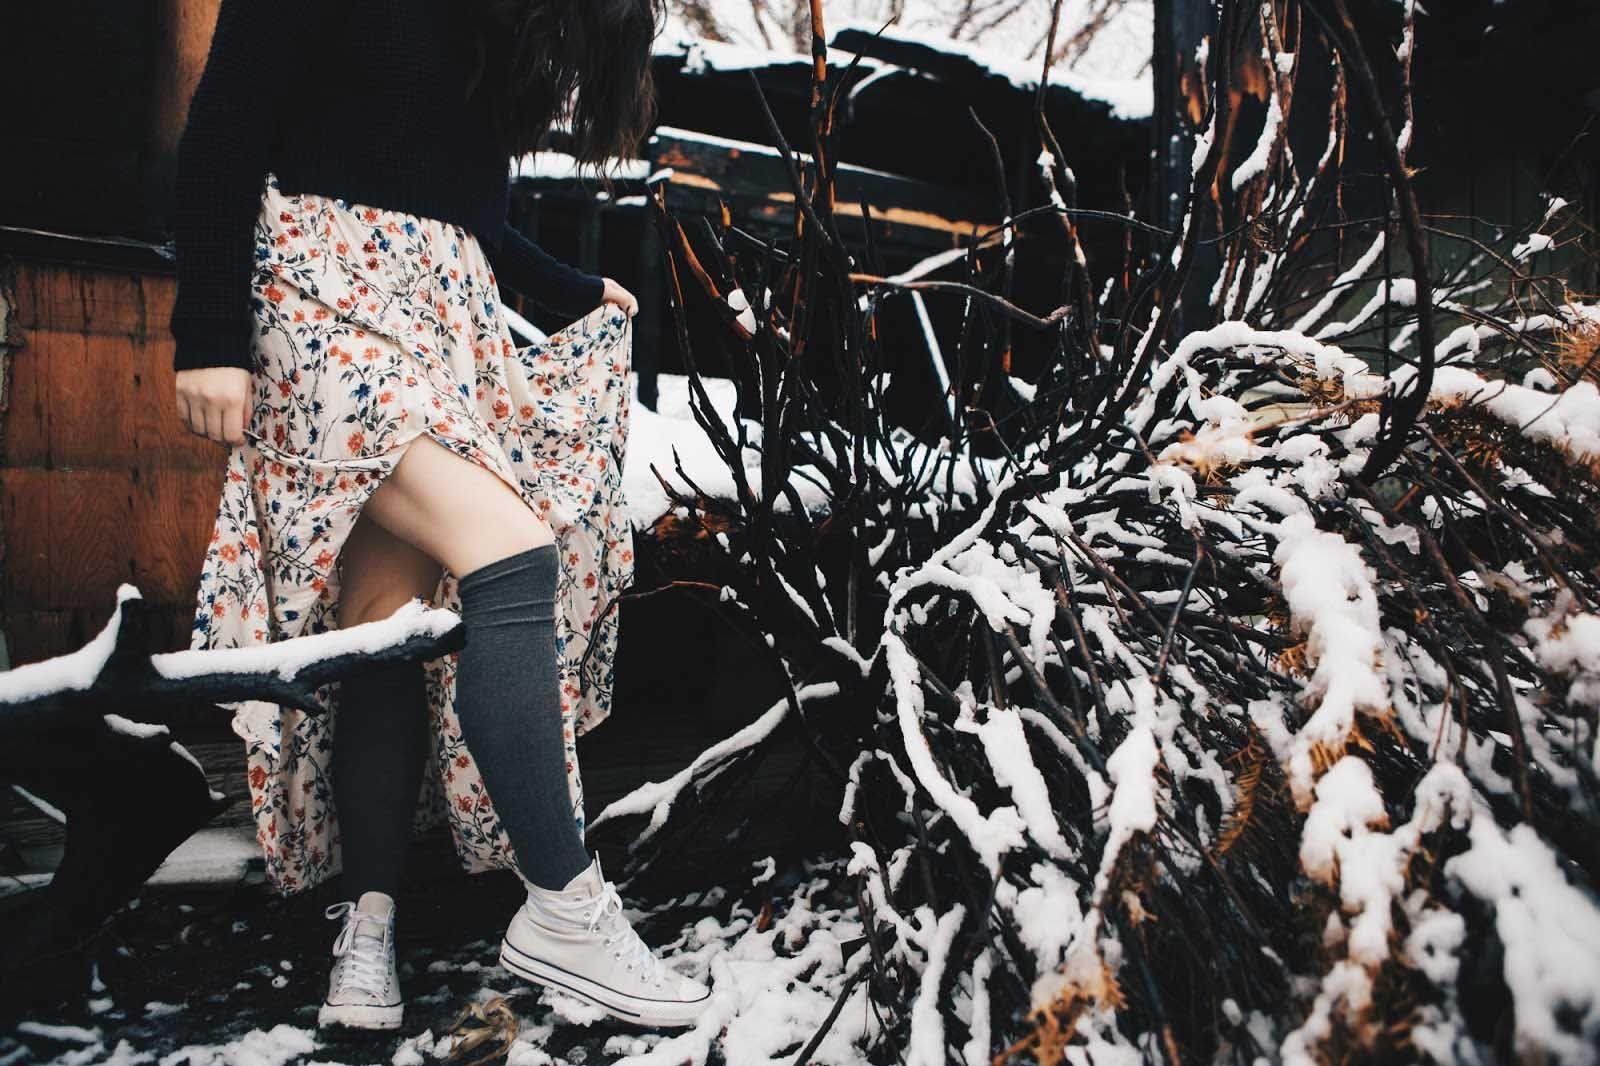 winter fashion & snow & maxi skirt & fashion photography & converse & thigh high socks